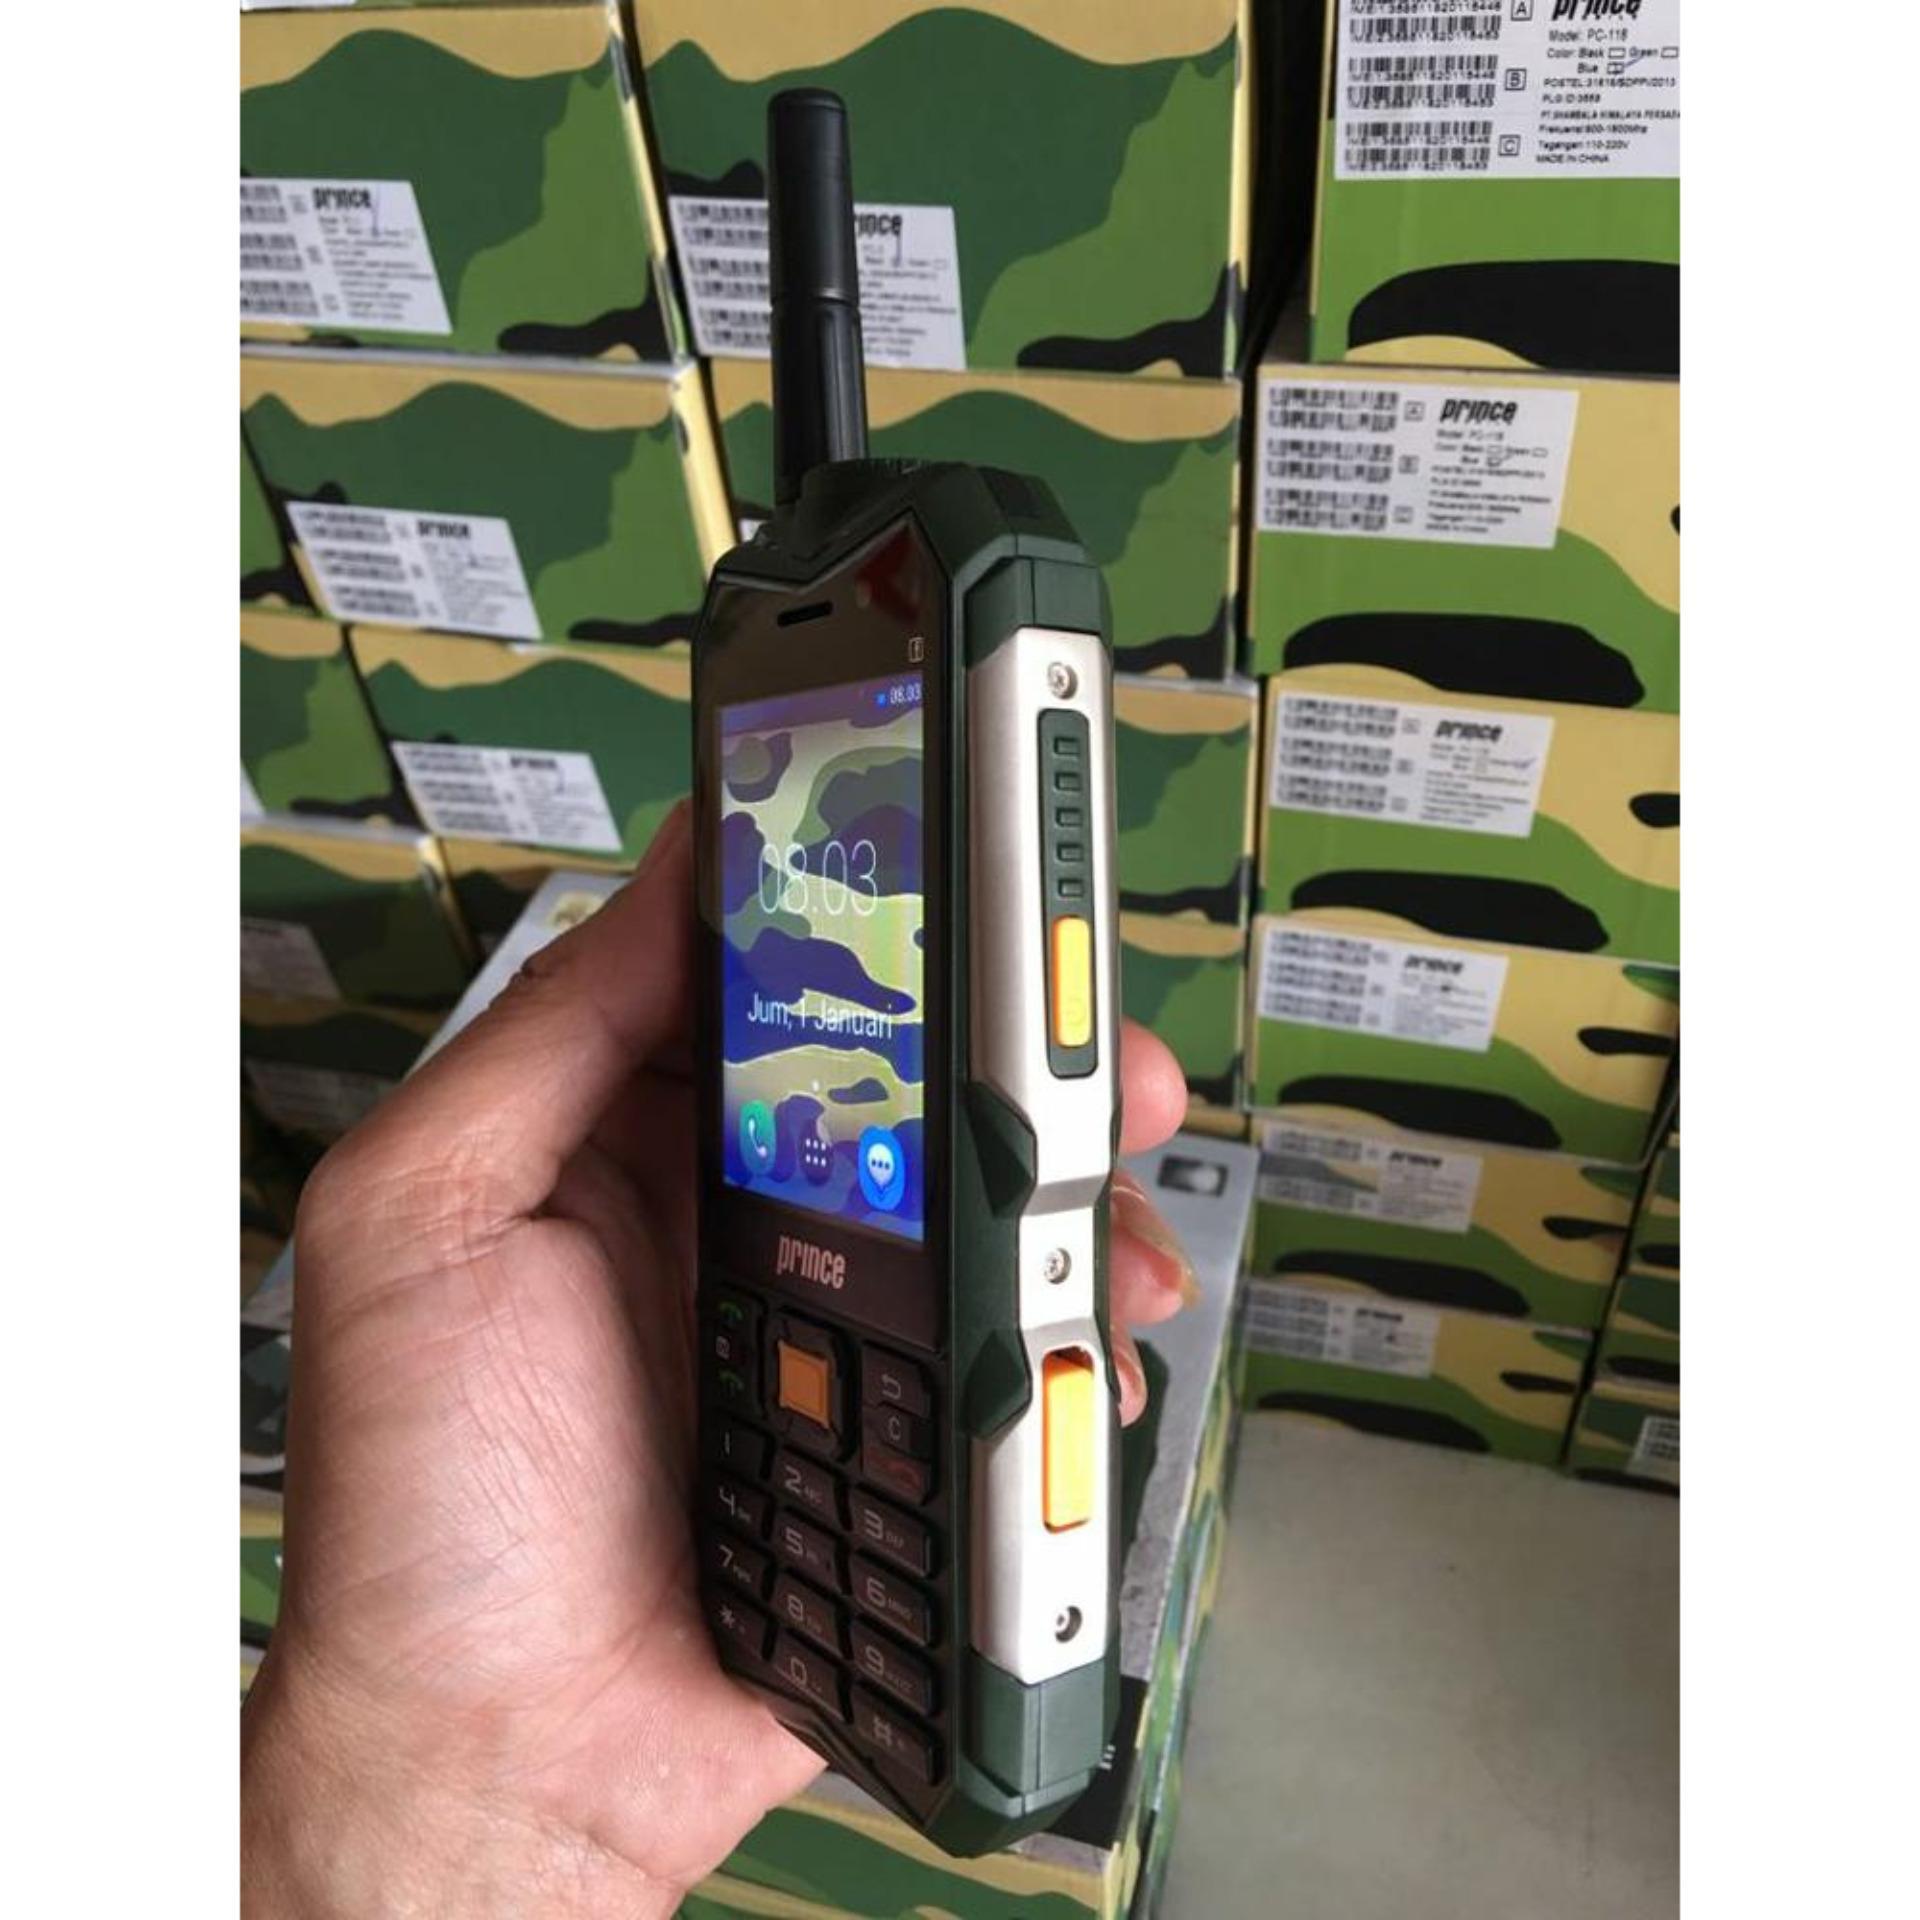 Prince PC-118 New Android rival prince 9000, brandcode B81 & B68, Aldo ...